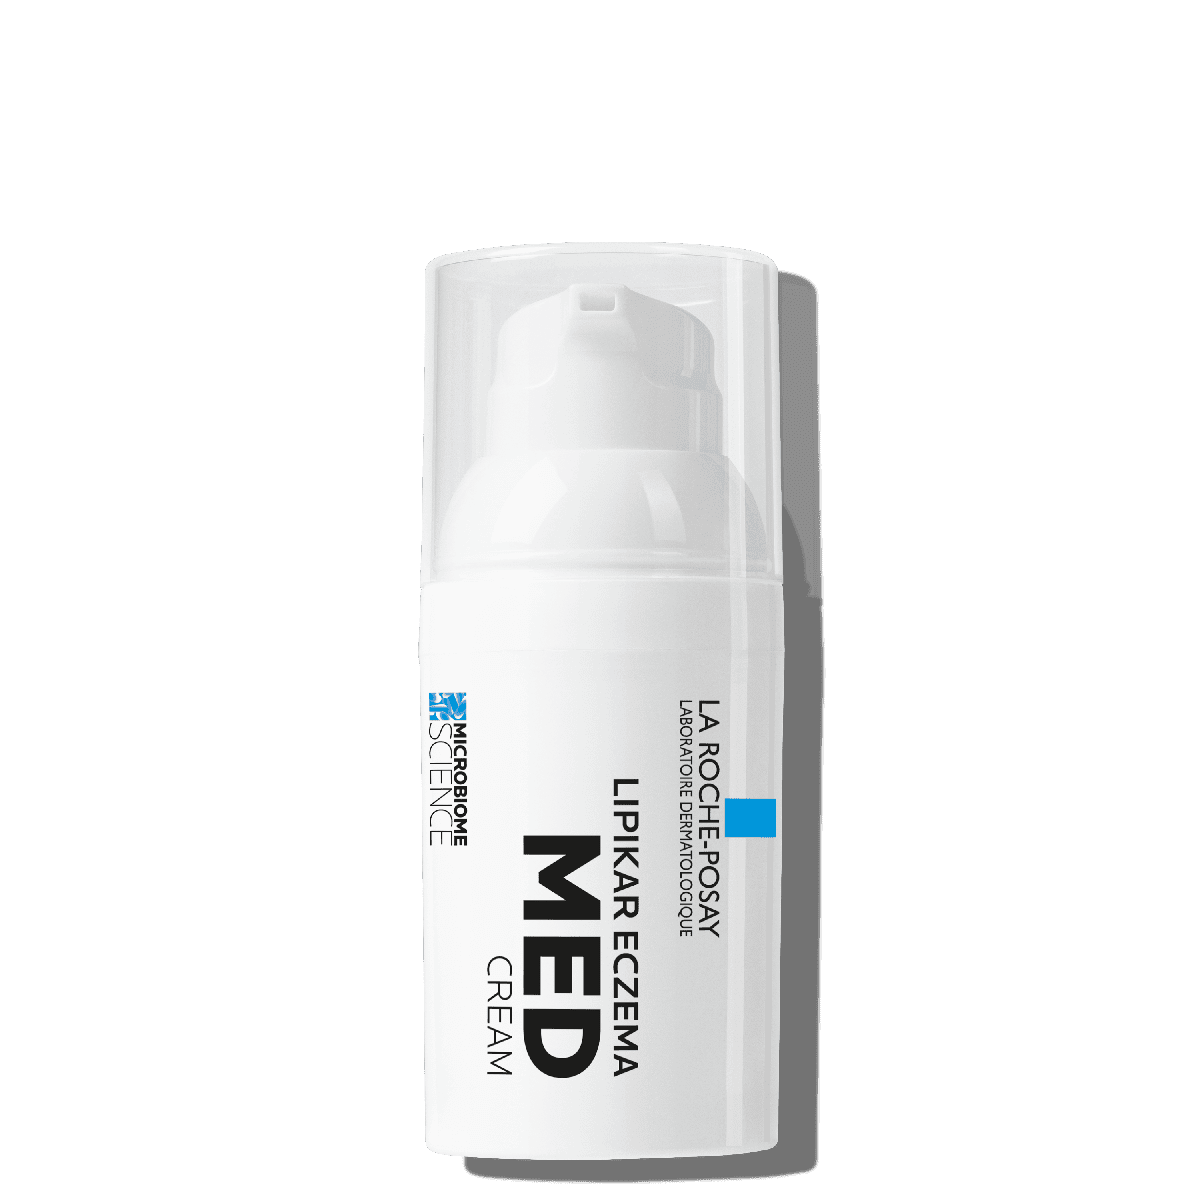 La-Roche-Posay-Lipikar-Eczema-Med-Cream-packshot-front-3337875771214